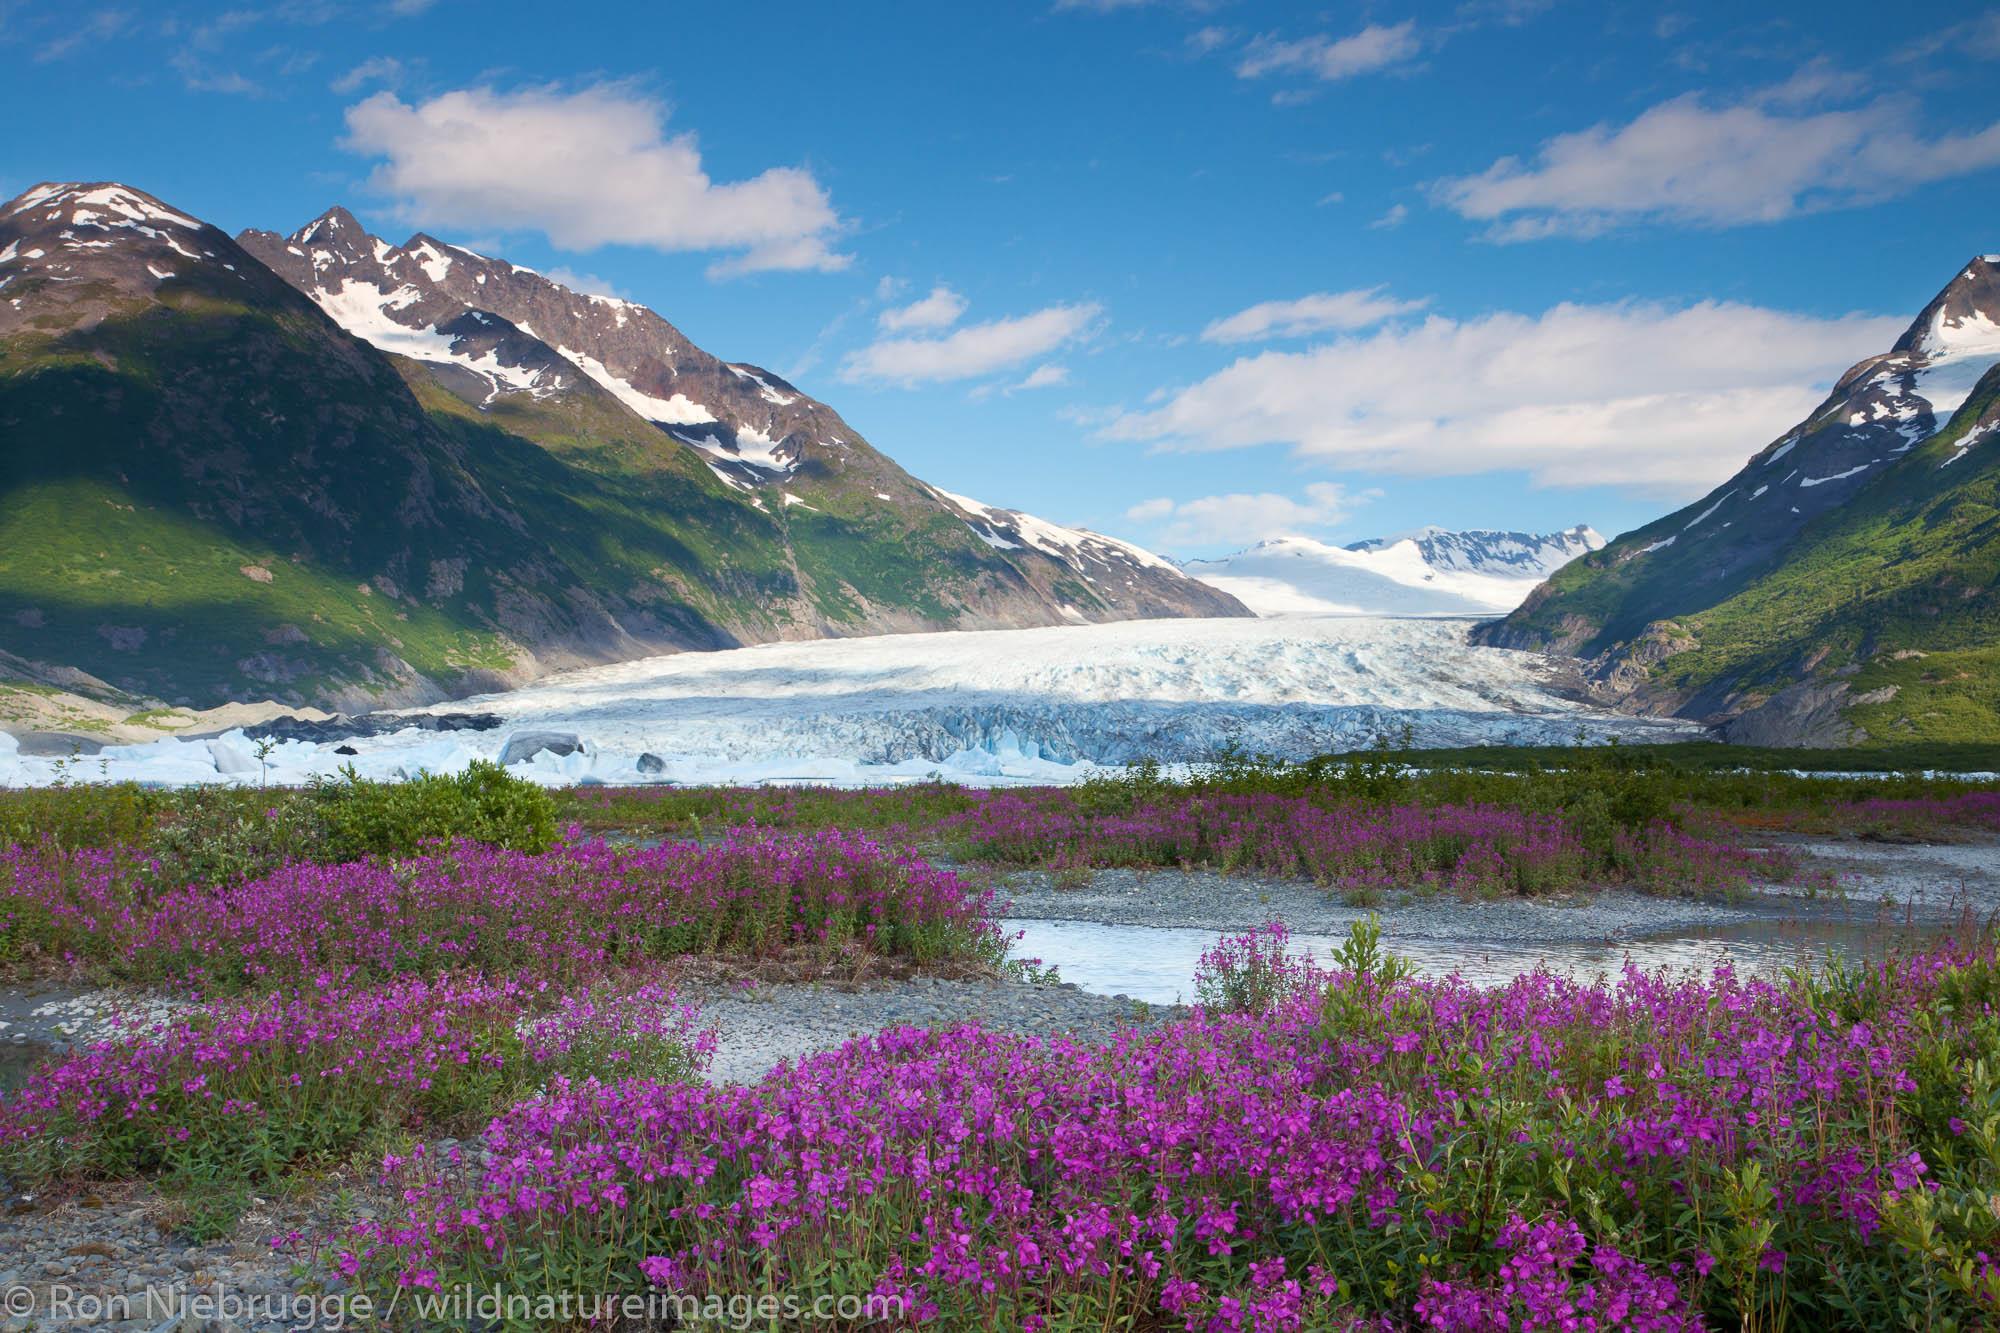 Wildflowers at Spencer Glacier, Chugach National Forest, Alaska.